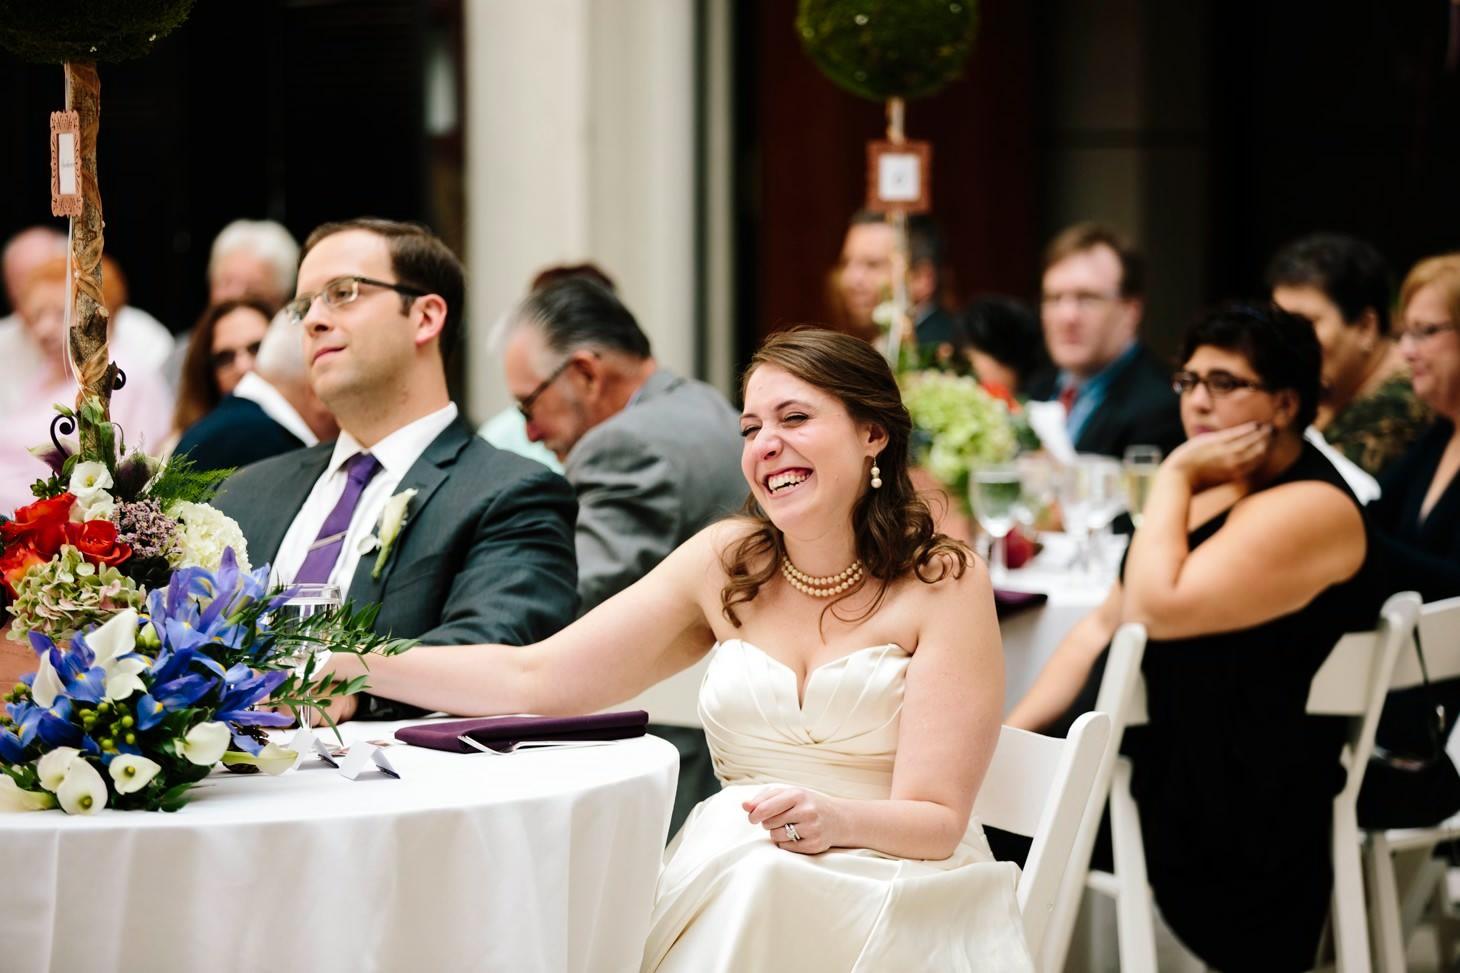 067-nyc-wedding-photographer-hoboken-waterfront-wedding-photos-smitten-chickens.jpg